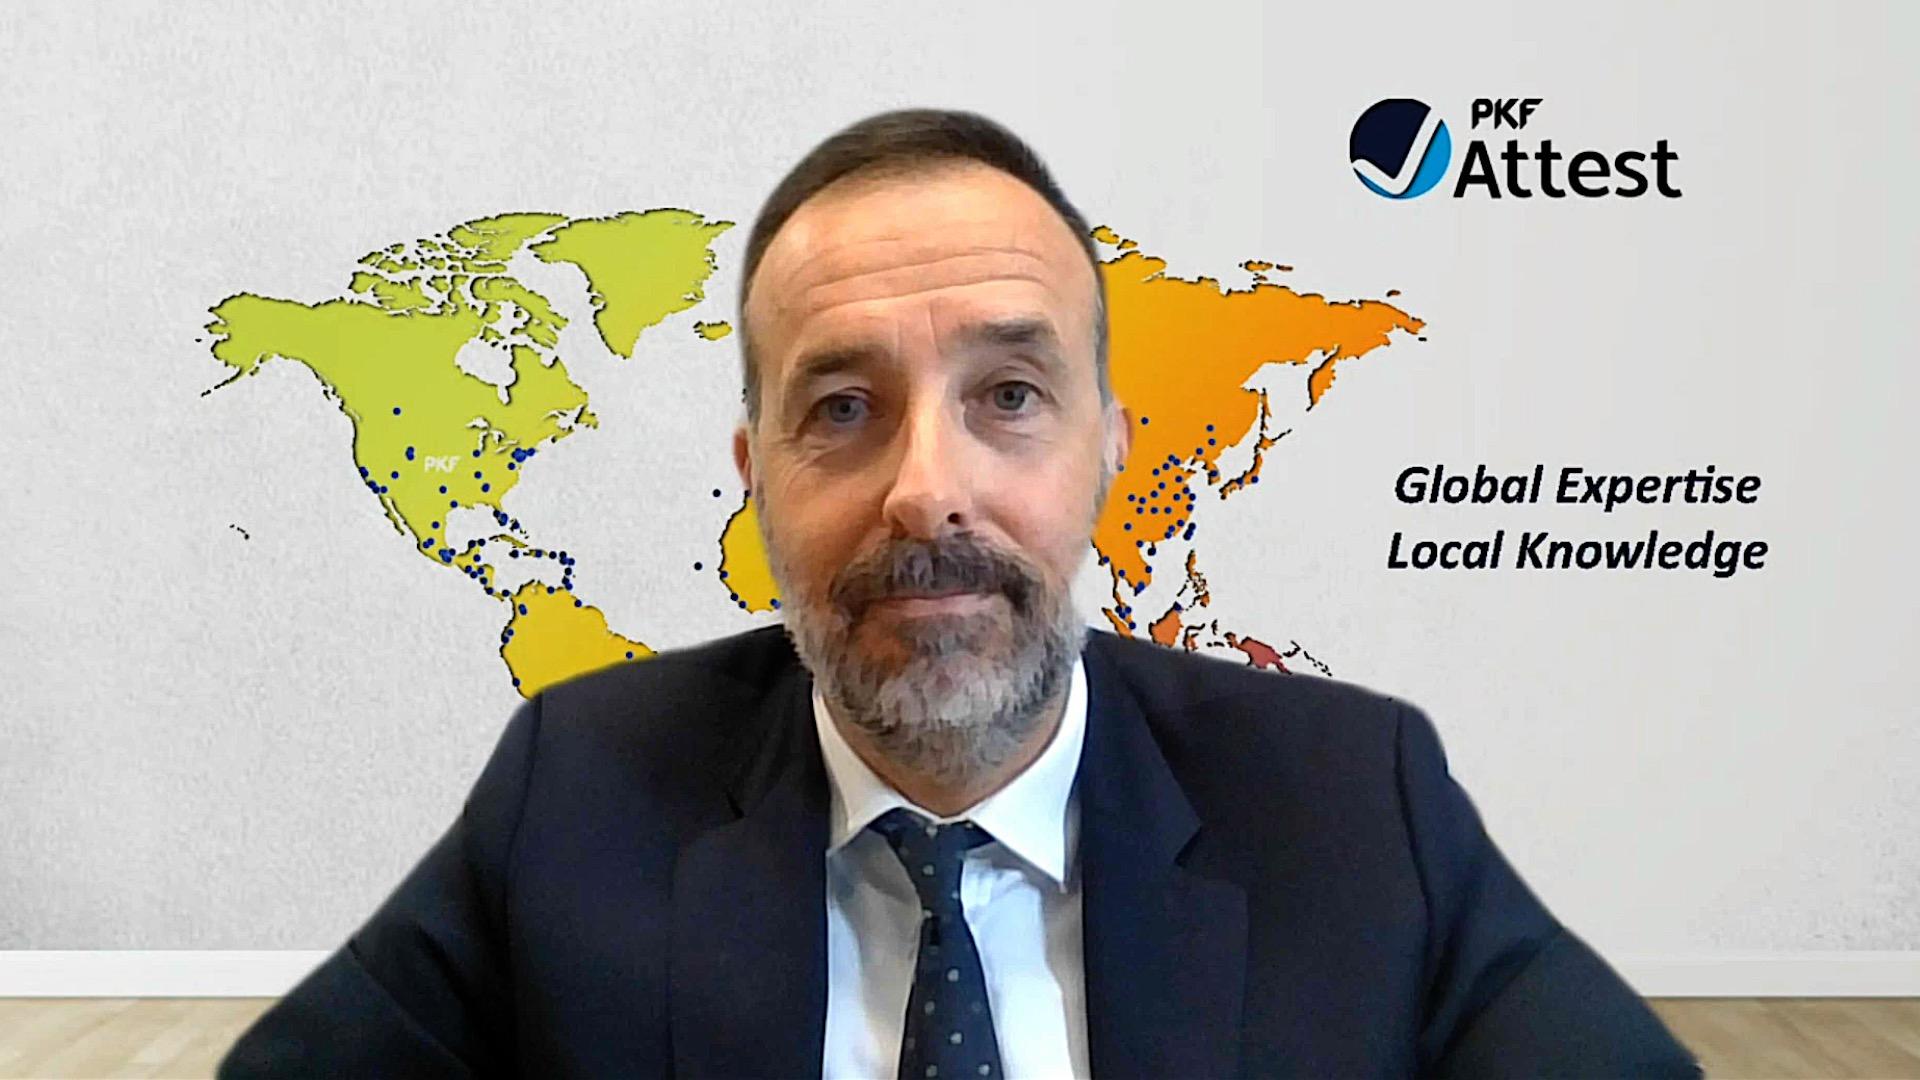 Mariano Aróstegui, Director del Área de Corporate Compliance en PFK Attest